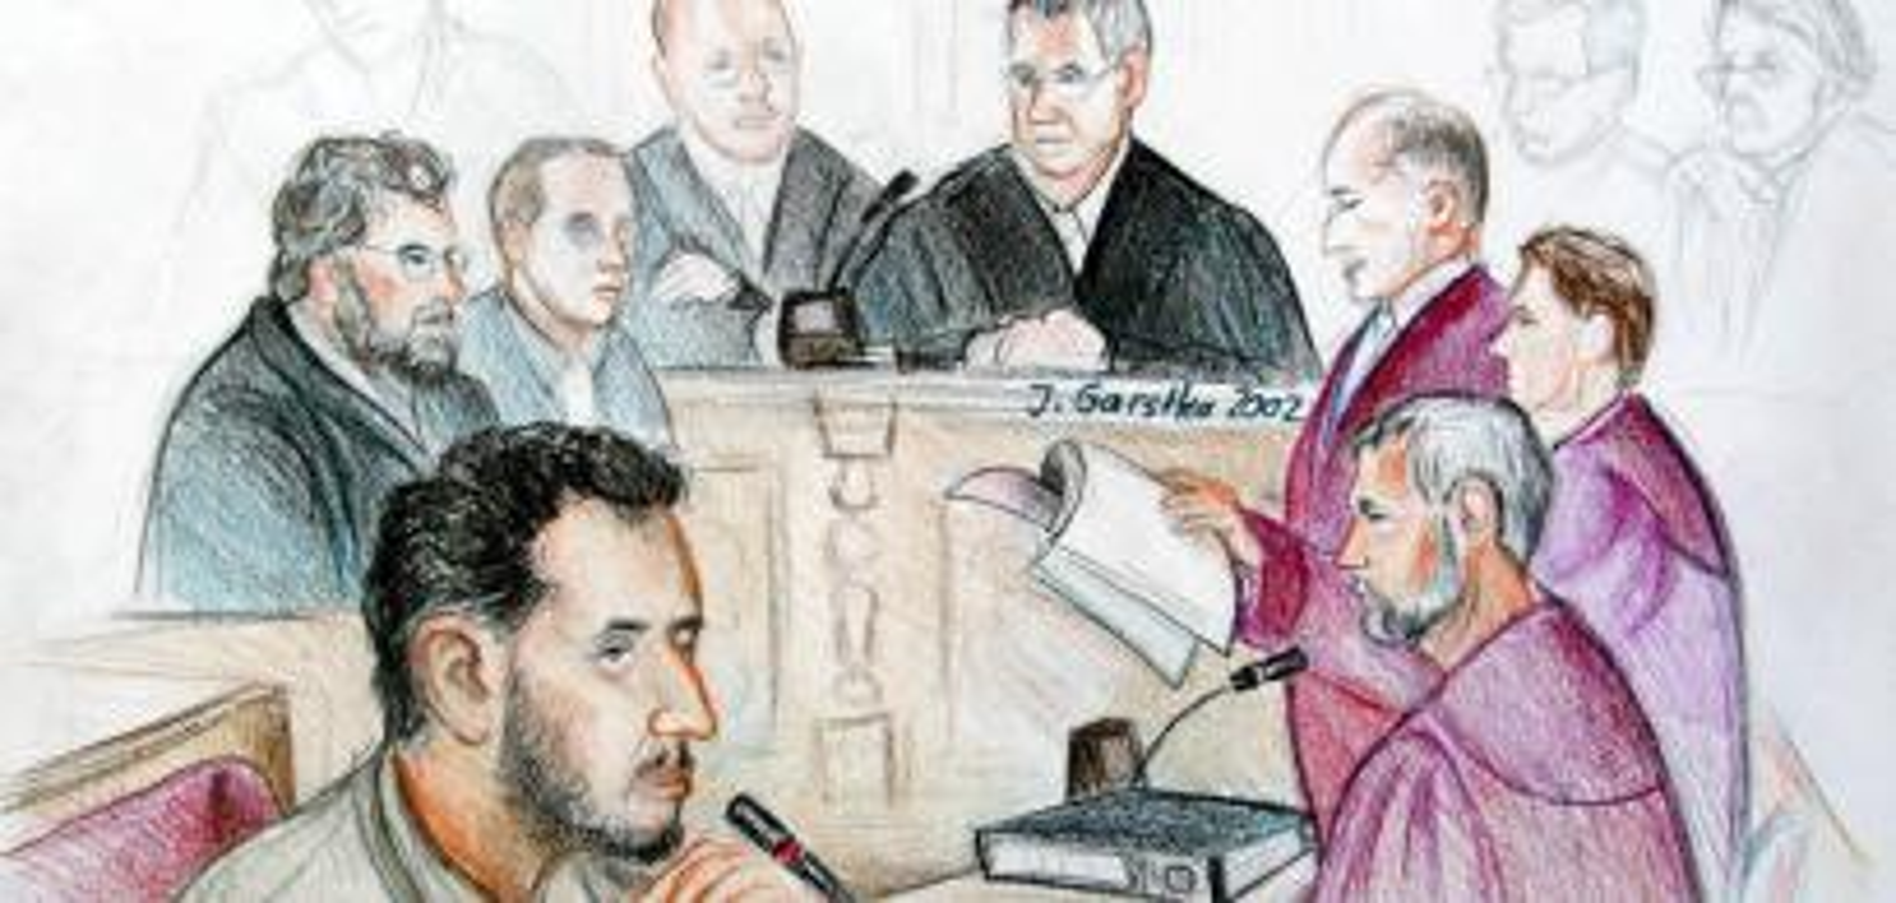 El-Motassadeq on trial